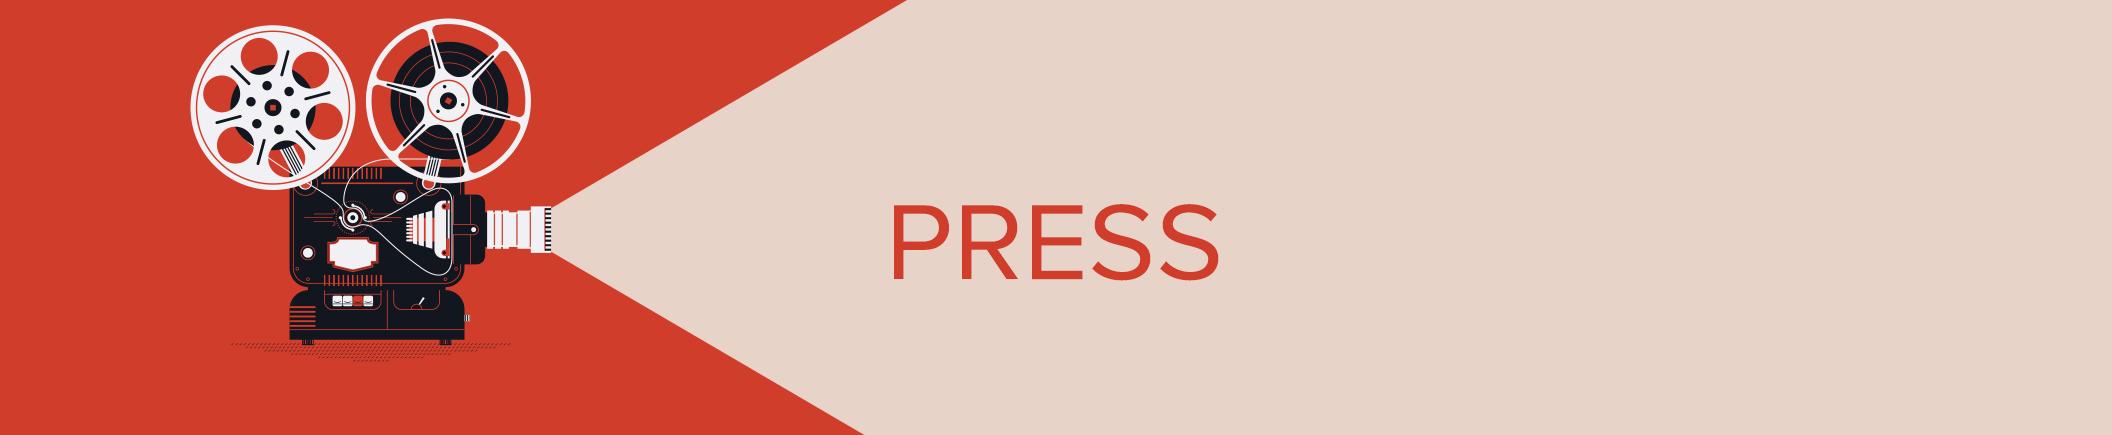 RBC_PressHeader.jpg